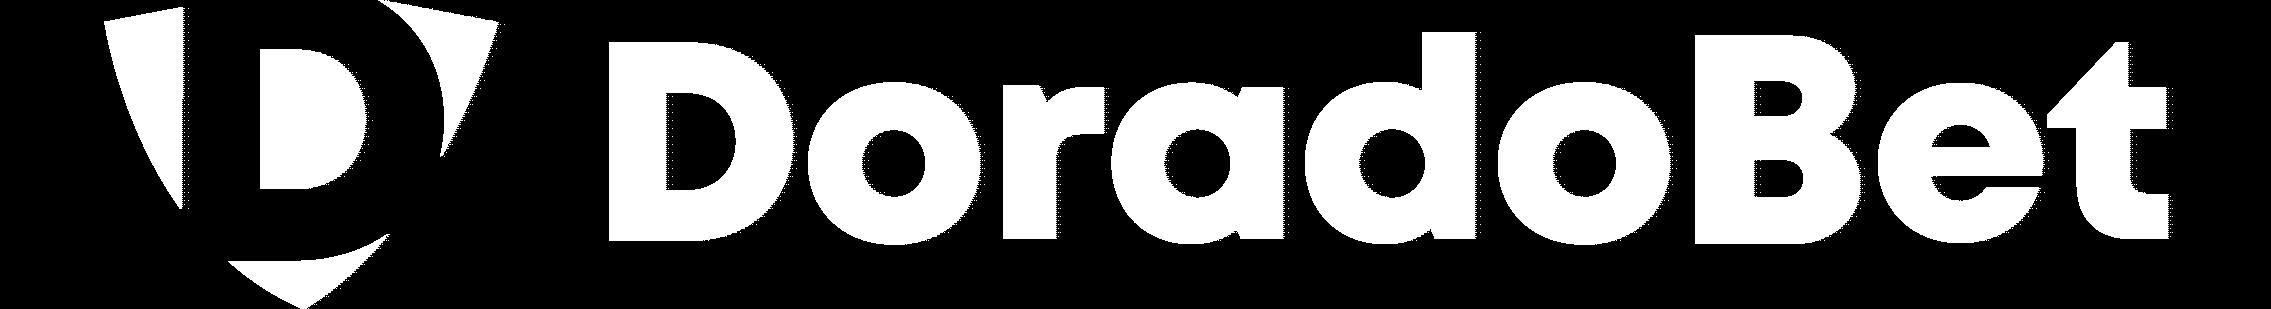 DoradoBet logo